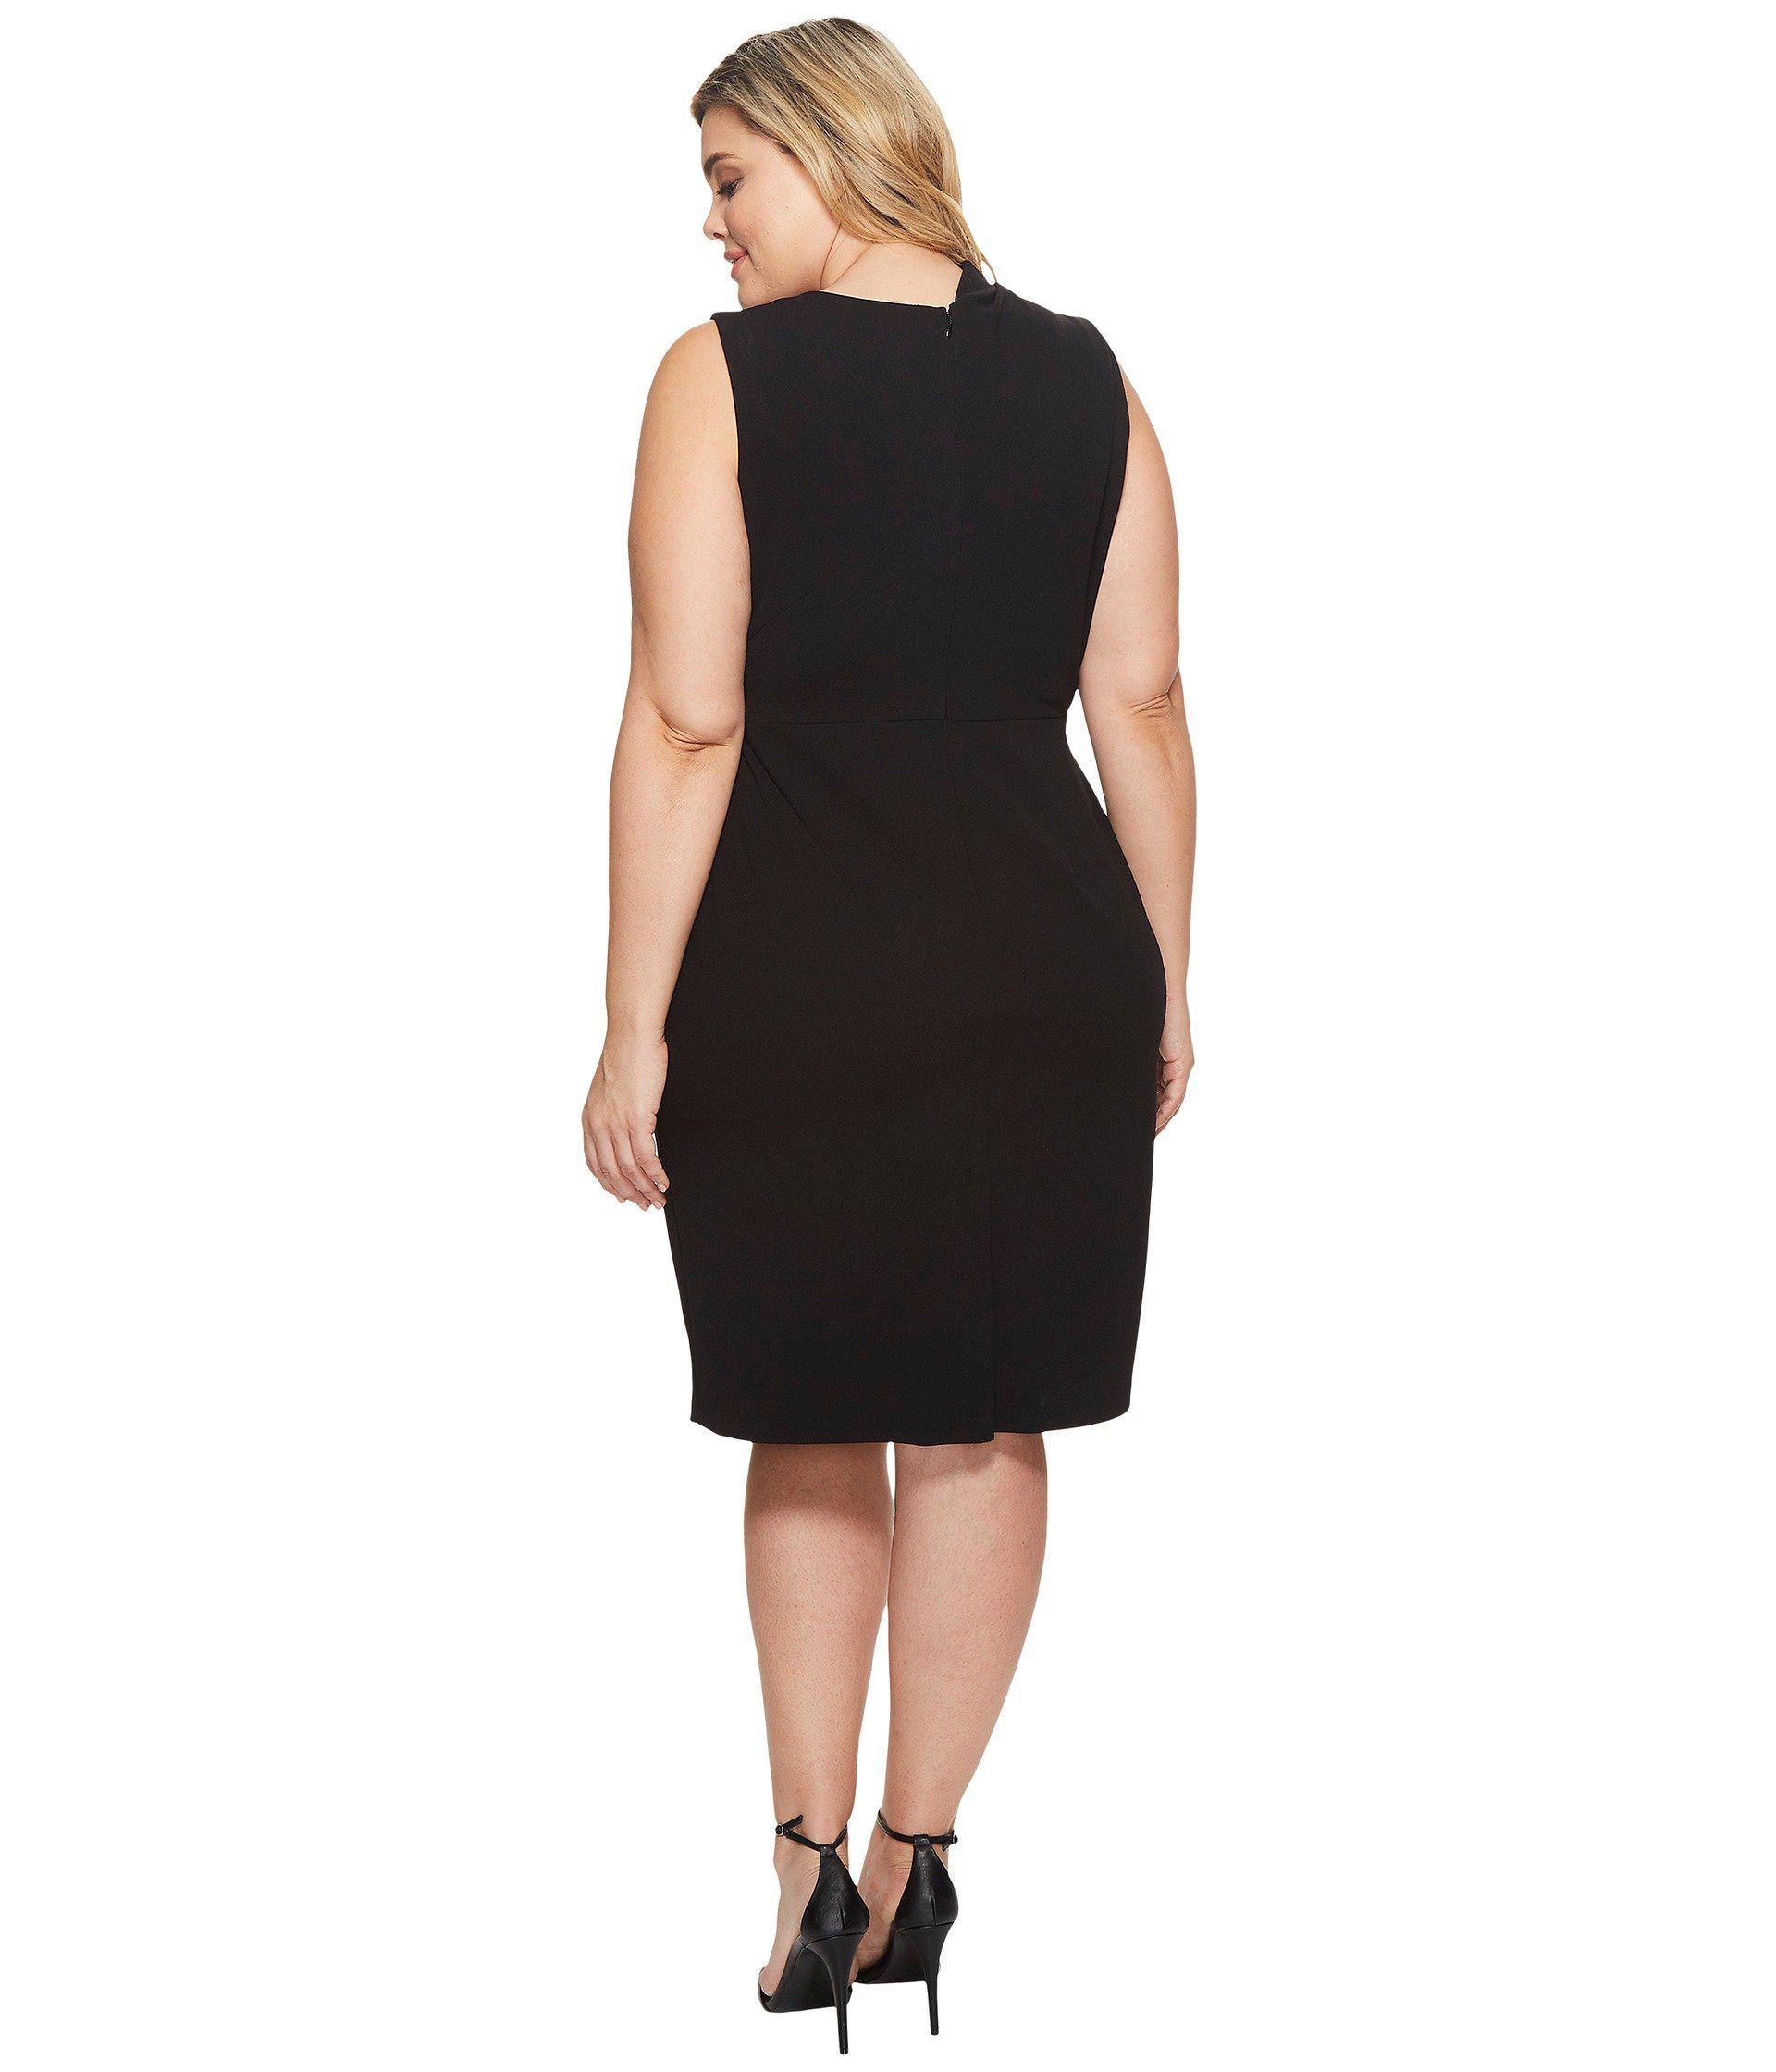 Adrianna Papell Synthetic Plus Size Drape Neck Sheath